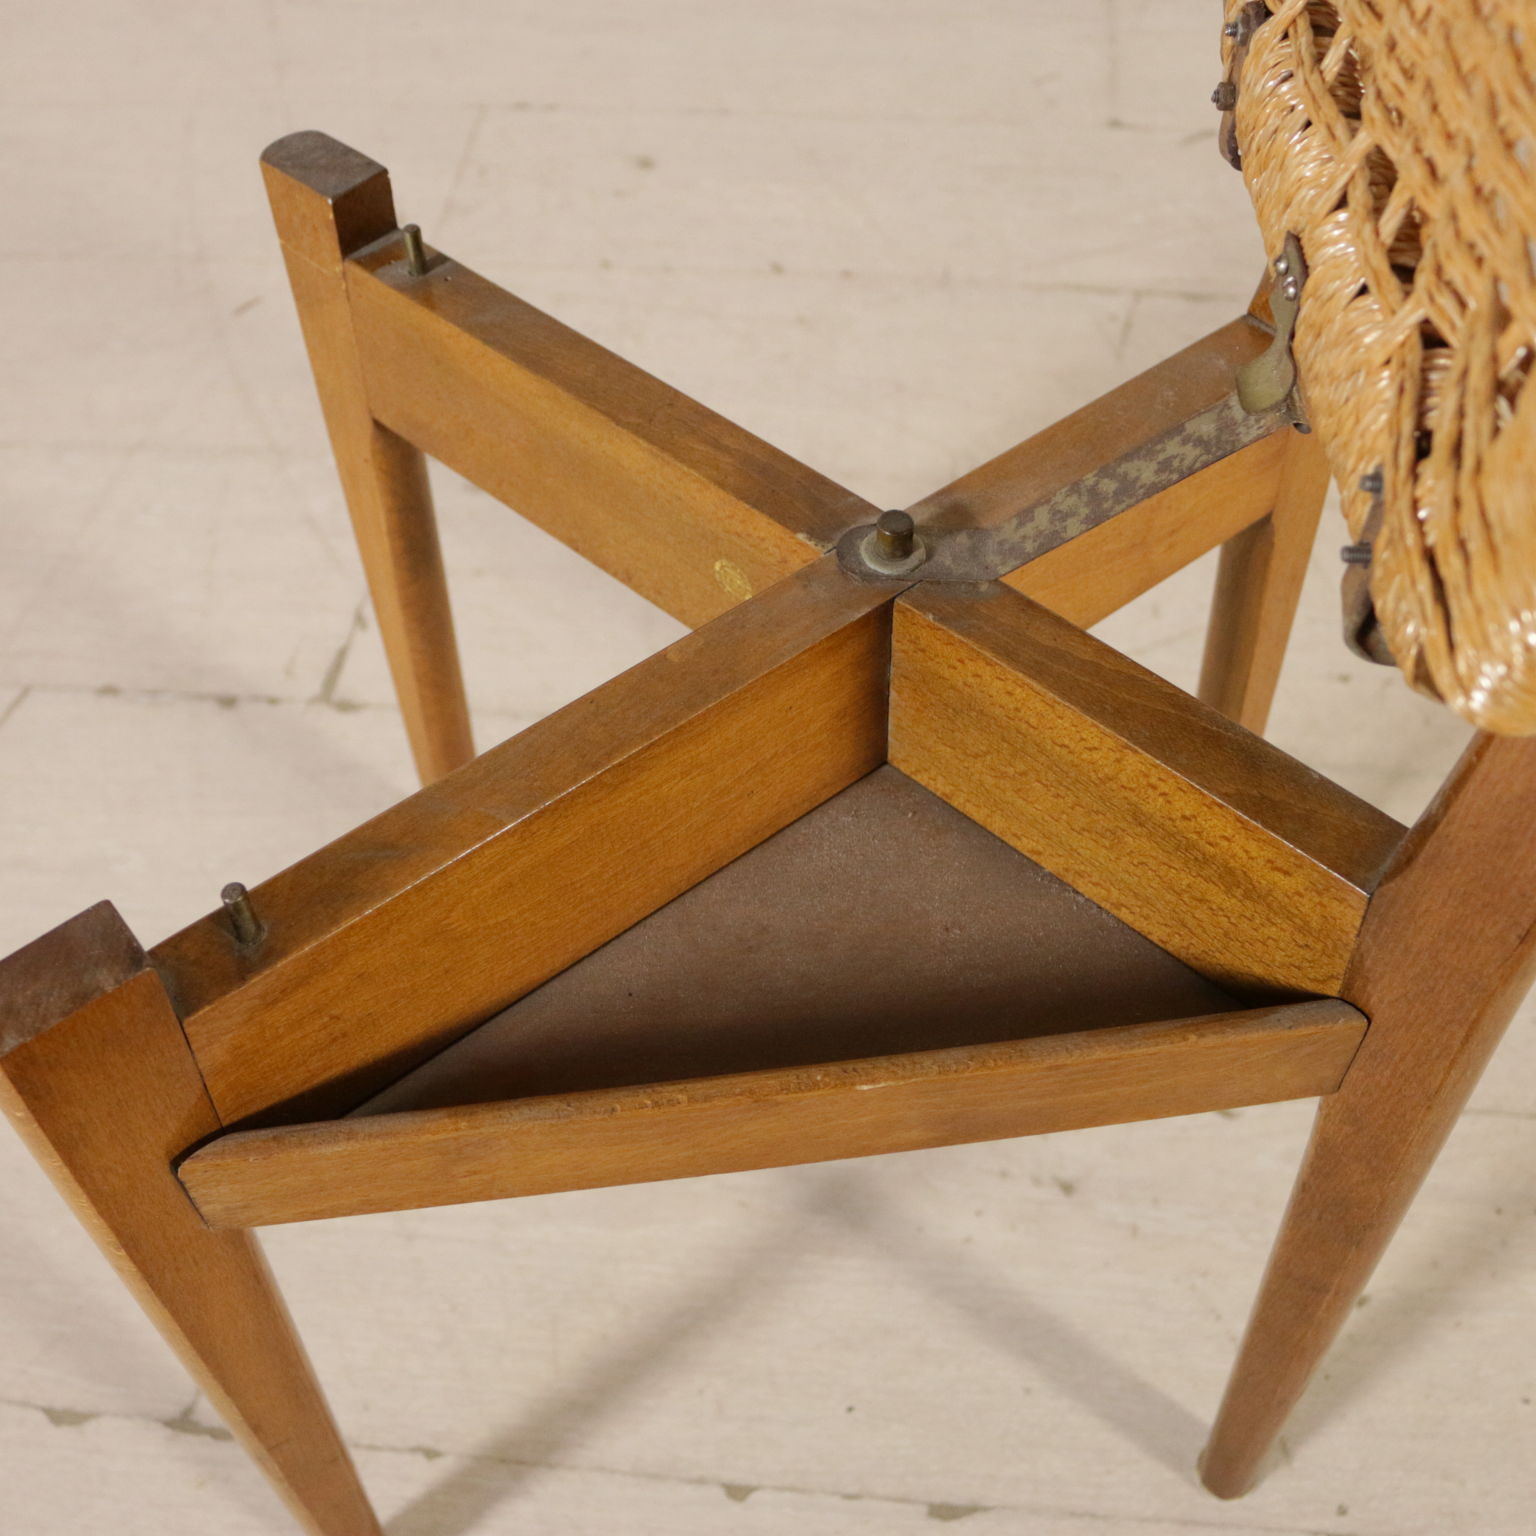 Sedia reguitti sedie modernariato for Sedia particolare